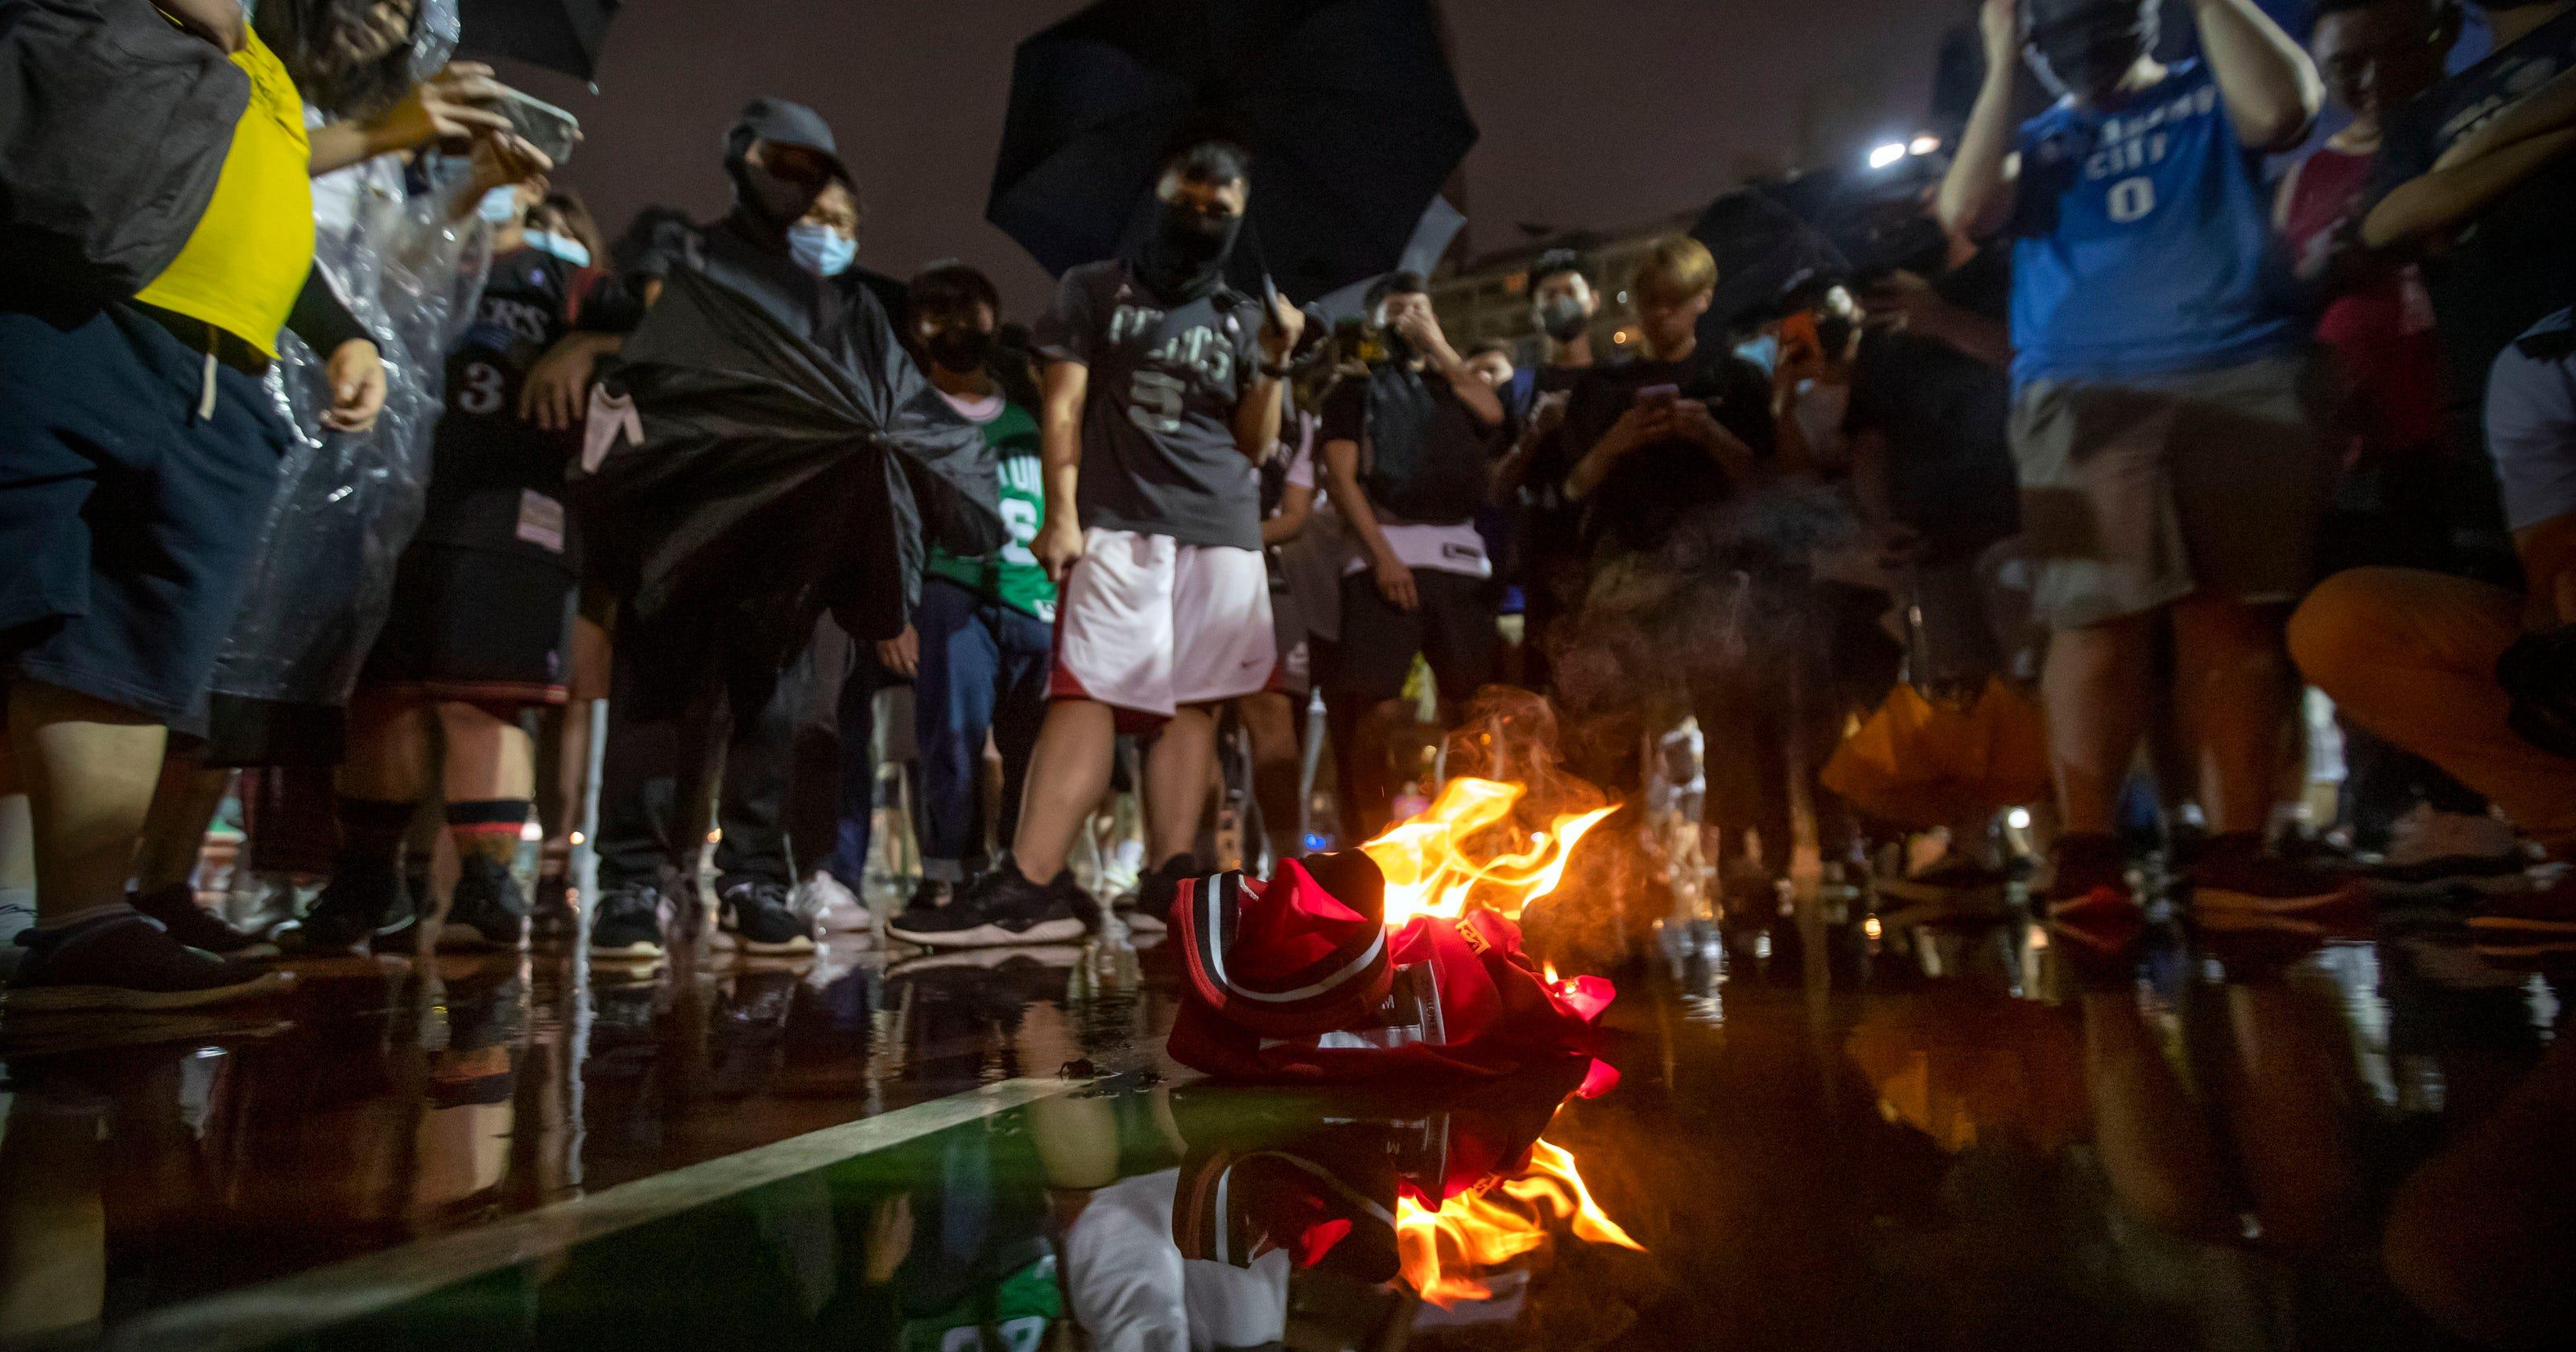 LeBron jerseys are lit. Literally.